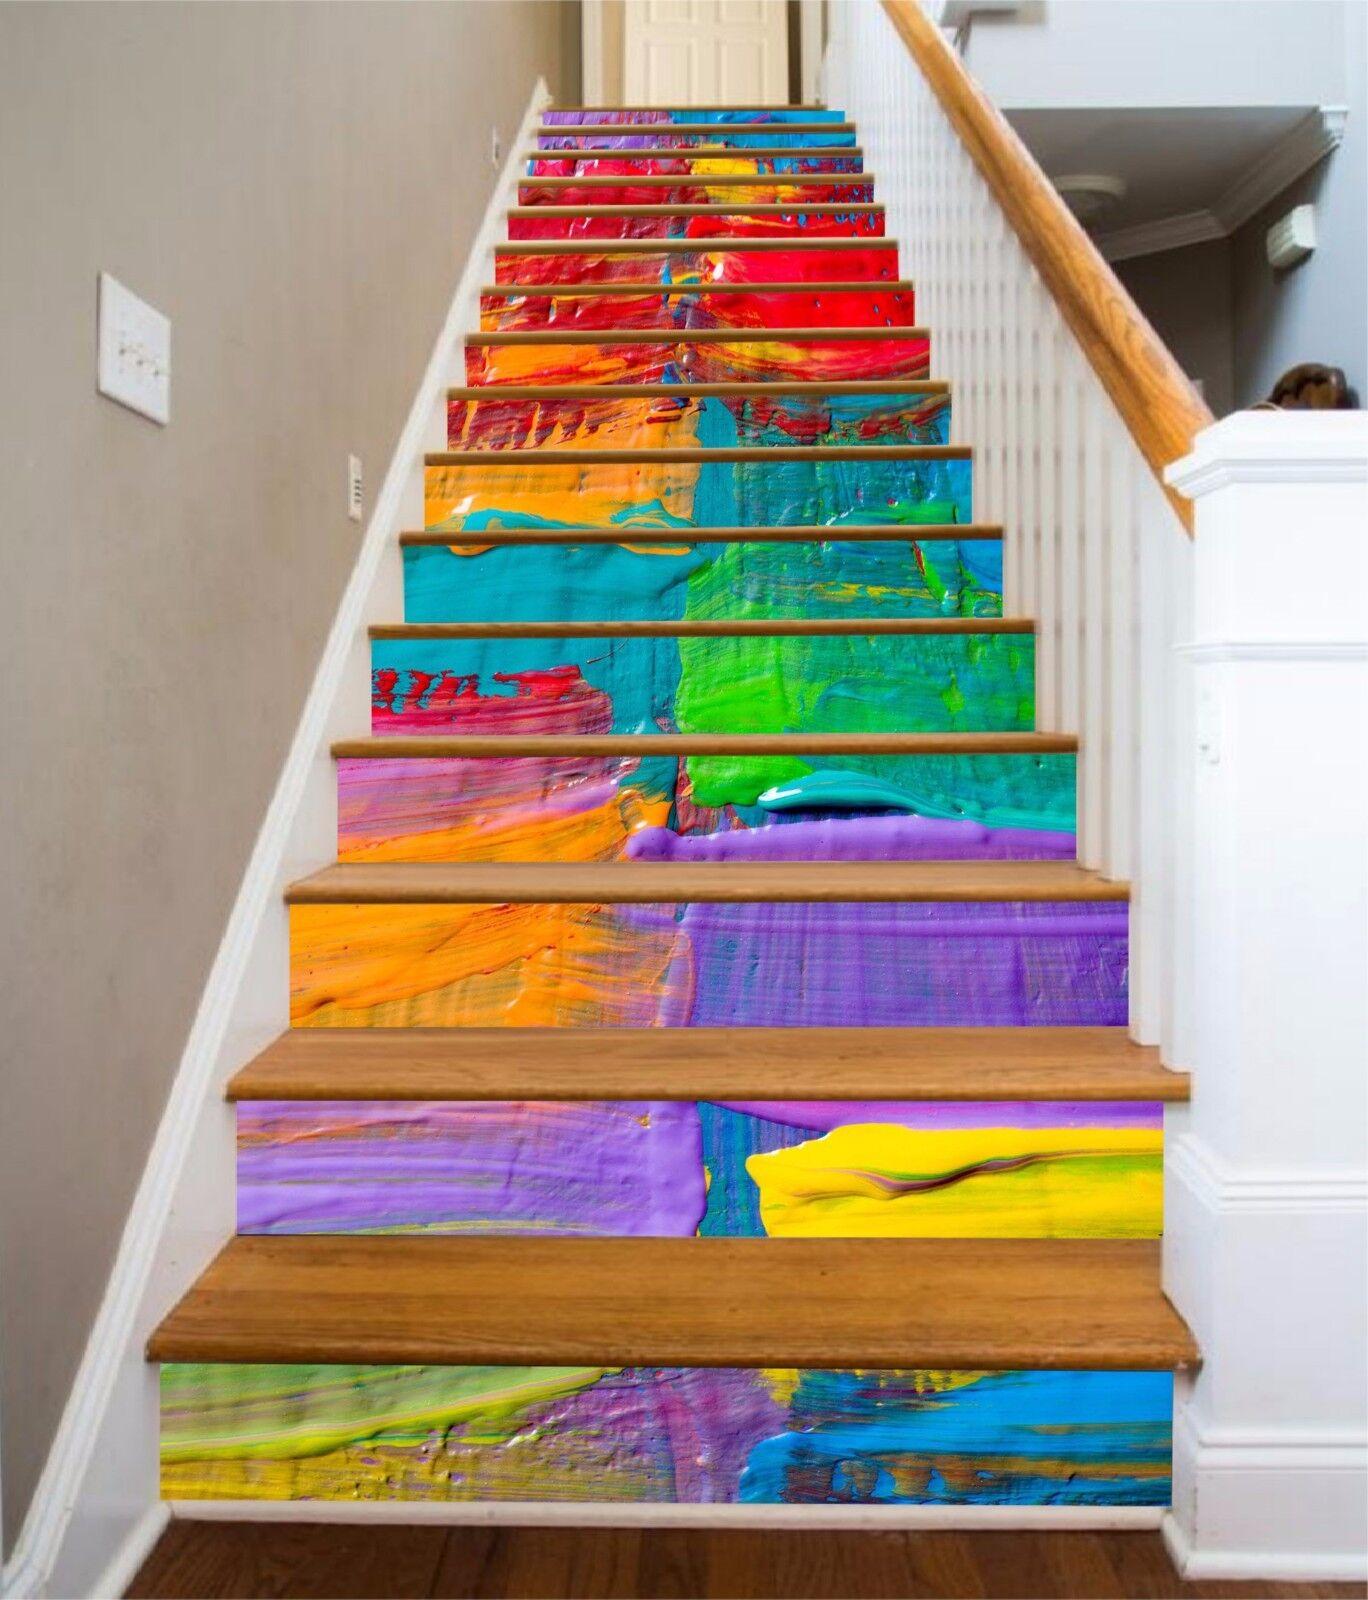 3D Farbeful 635  Stair Risers Decoration Photo Mural Vinyl Decal Wallpaper UK